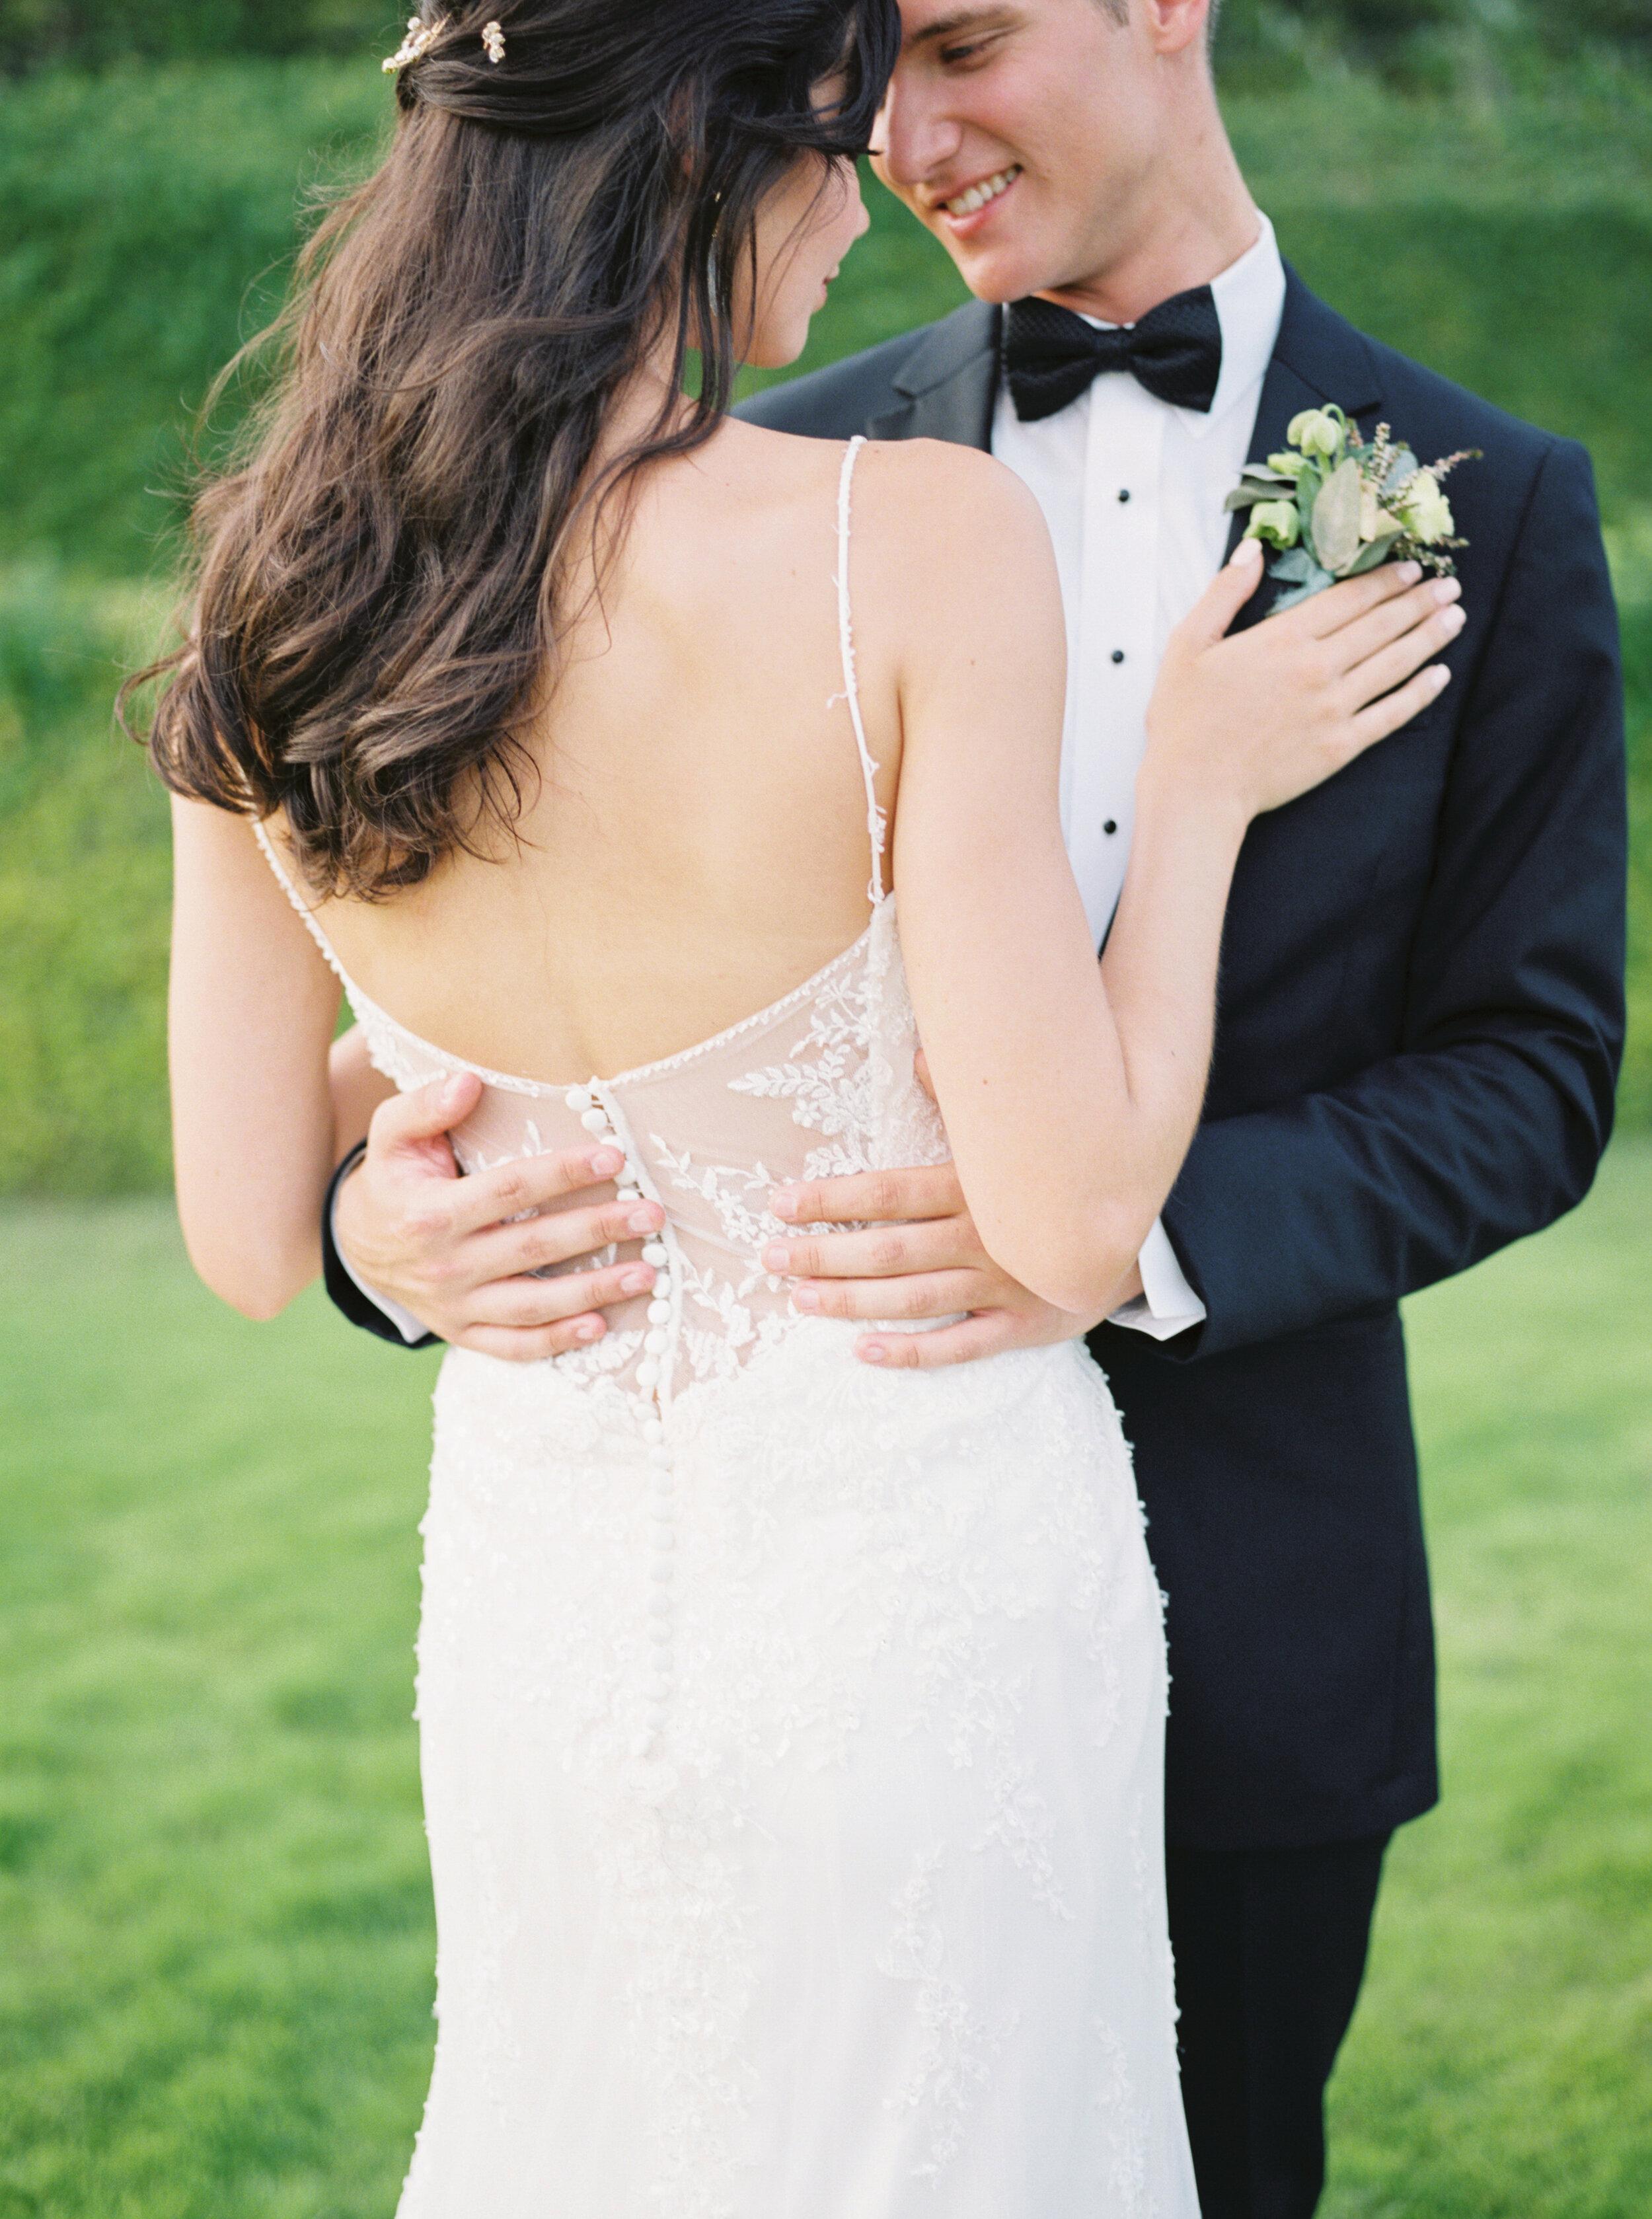 Bibb_Mill_Wedding_Editorial_Columbus_Georgia_Fallen_Photography_6-68.JPG